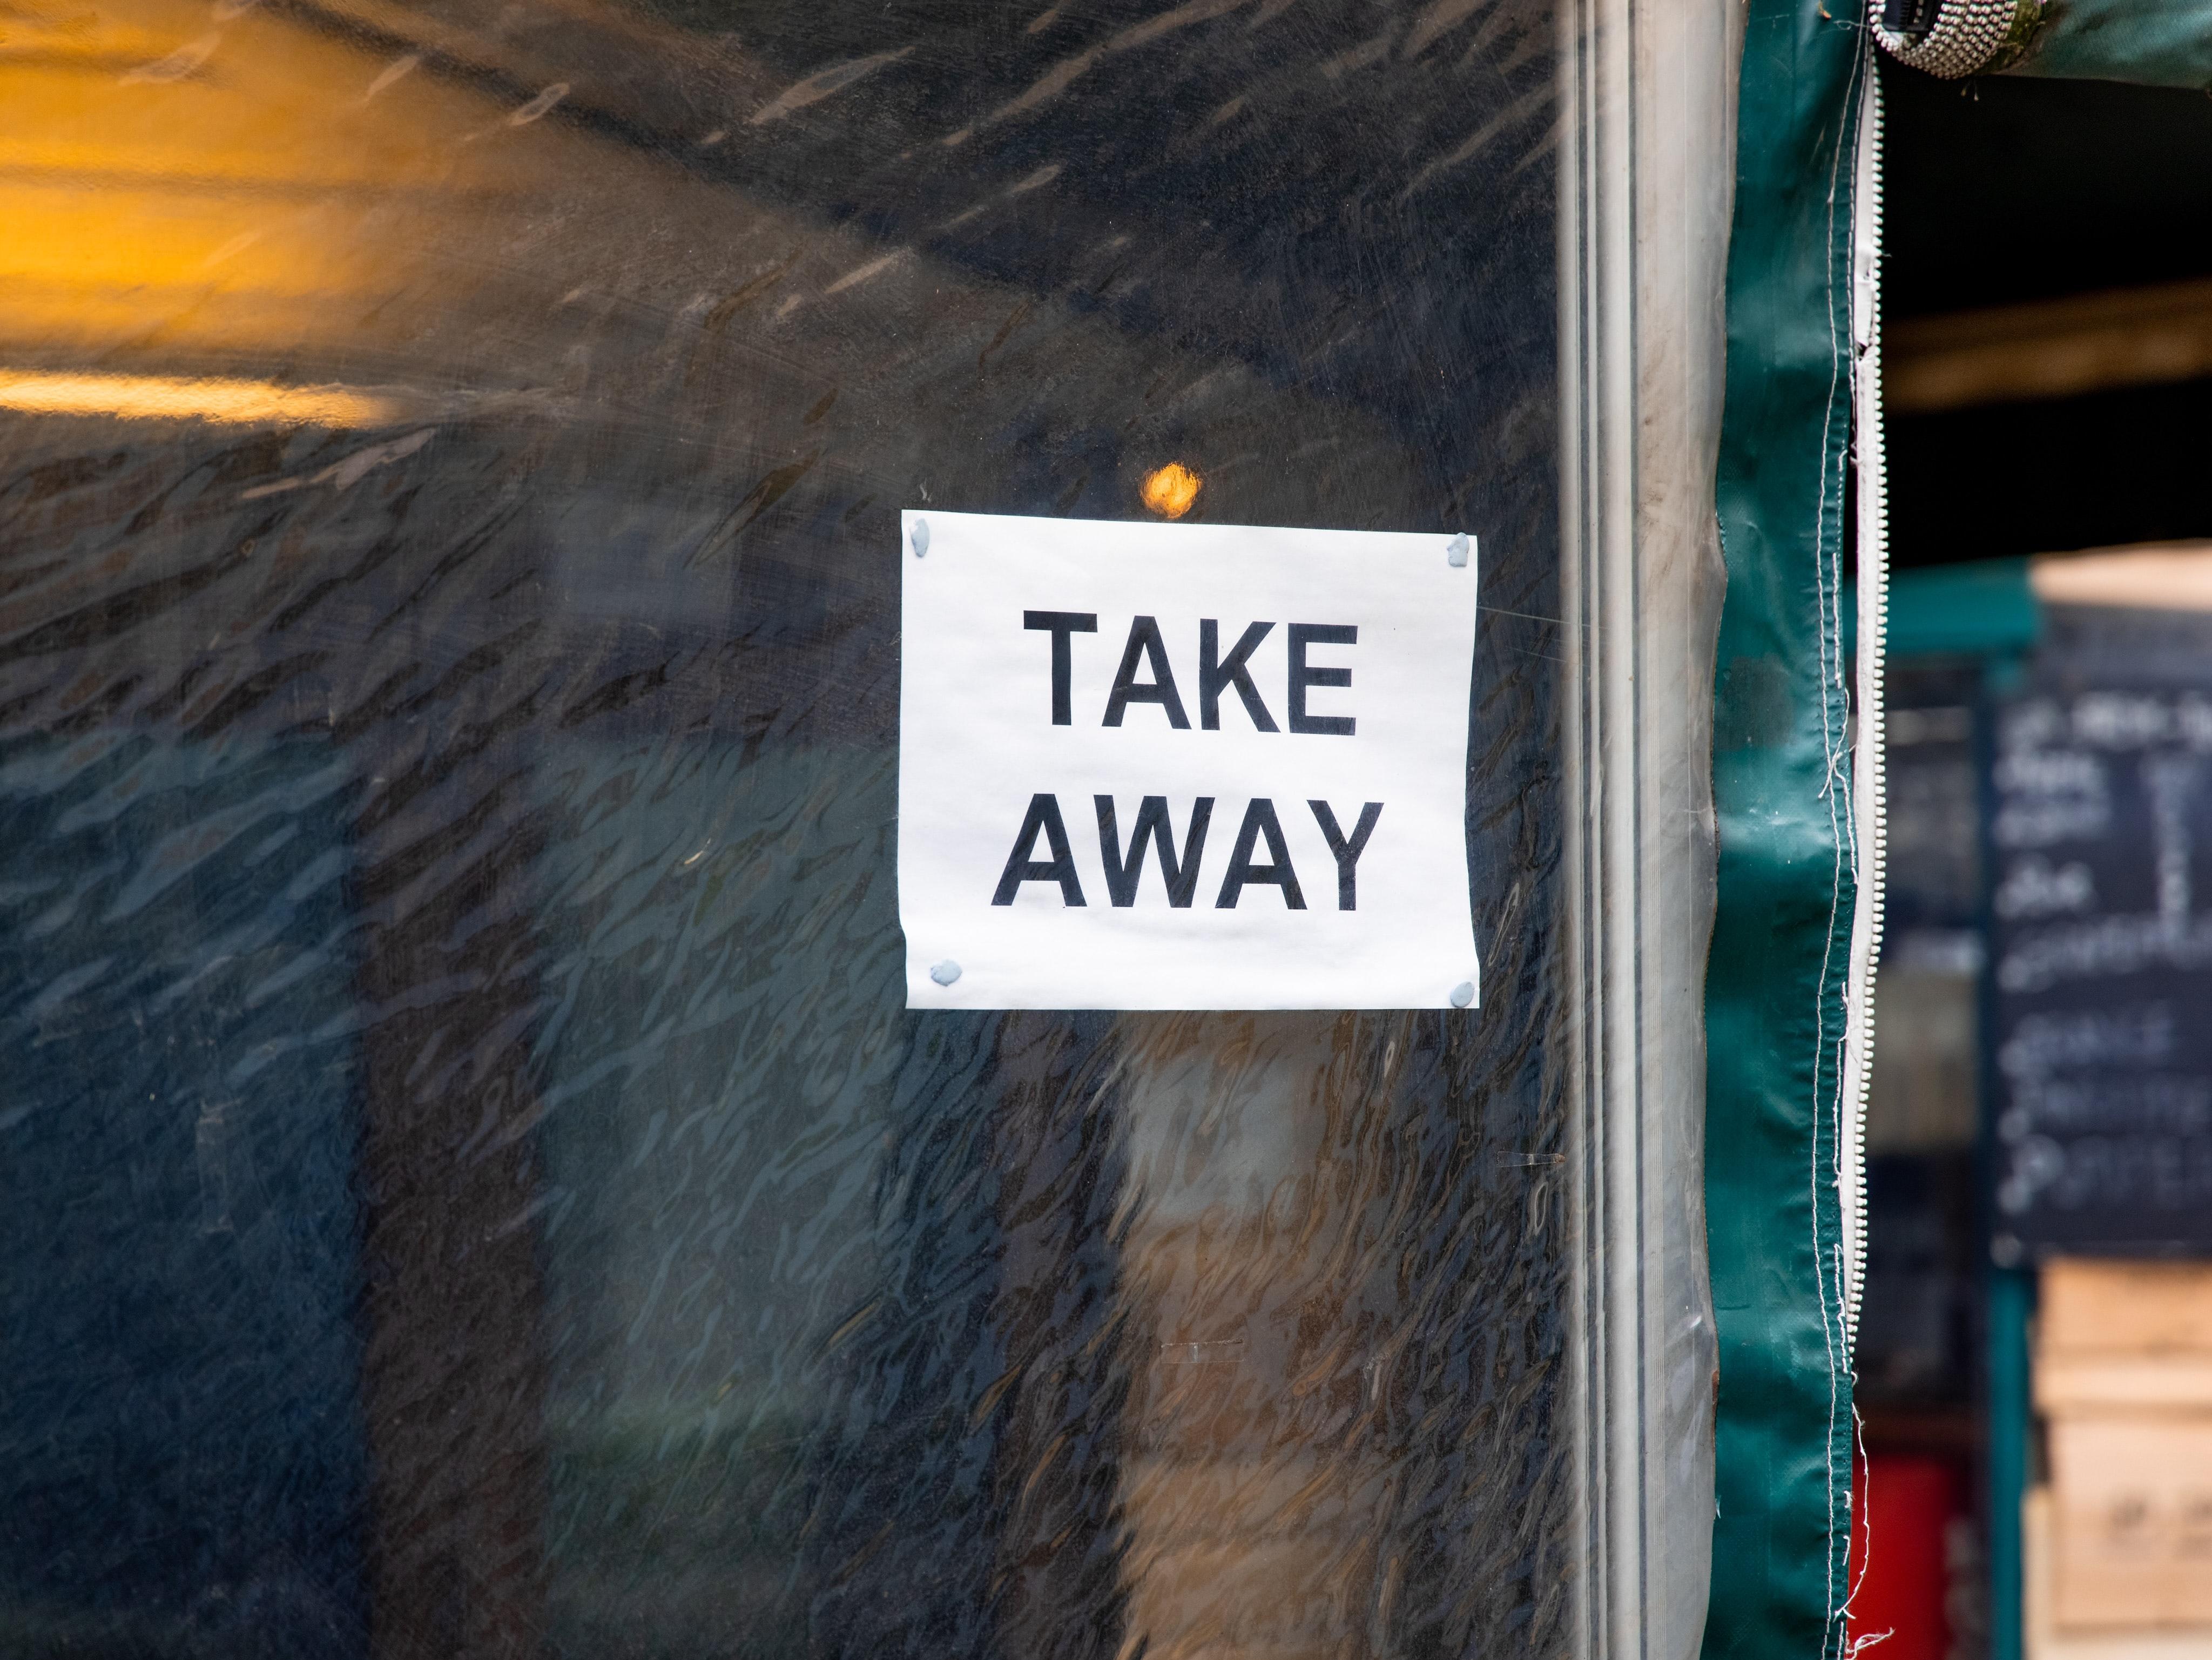 Take Away sign on glass window